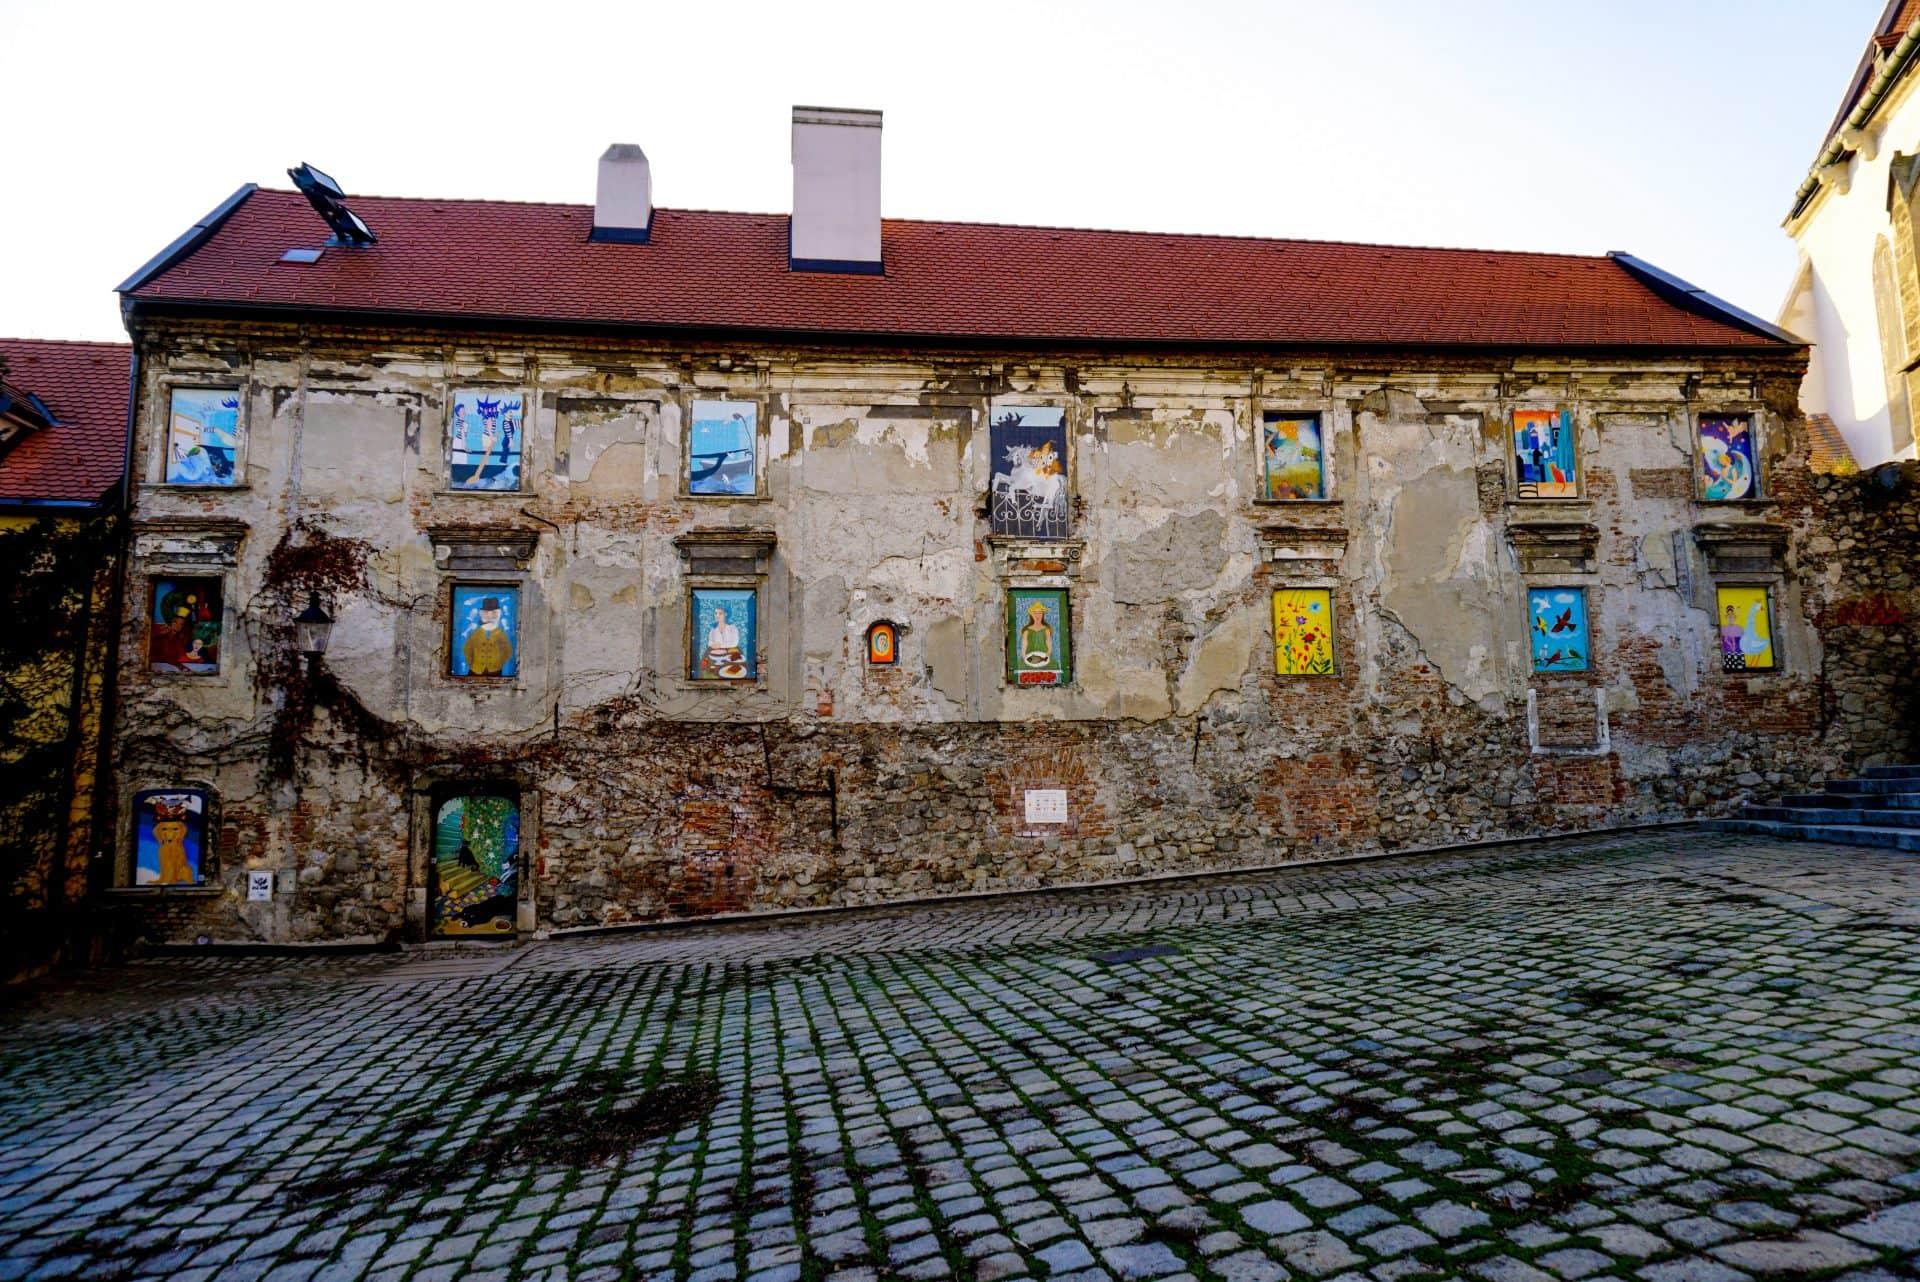 Divadlo Bratislavsky Gasparko, Bratislava, Slovakia – Experiencing the Globe